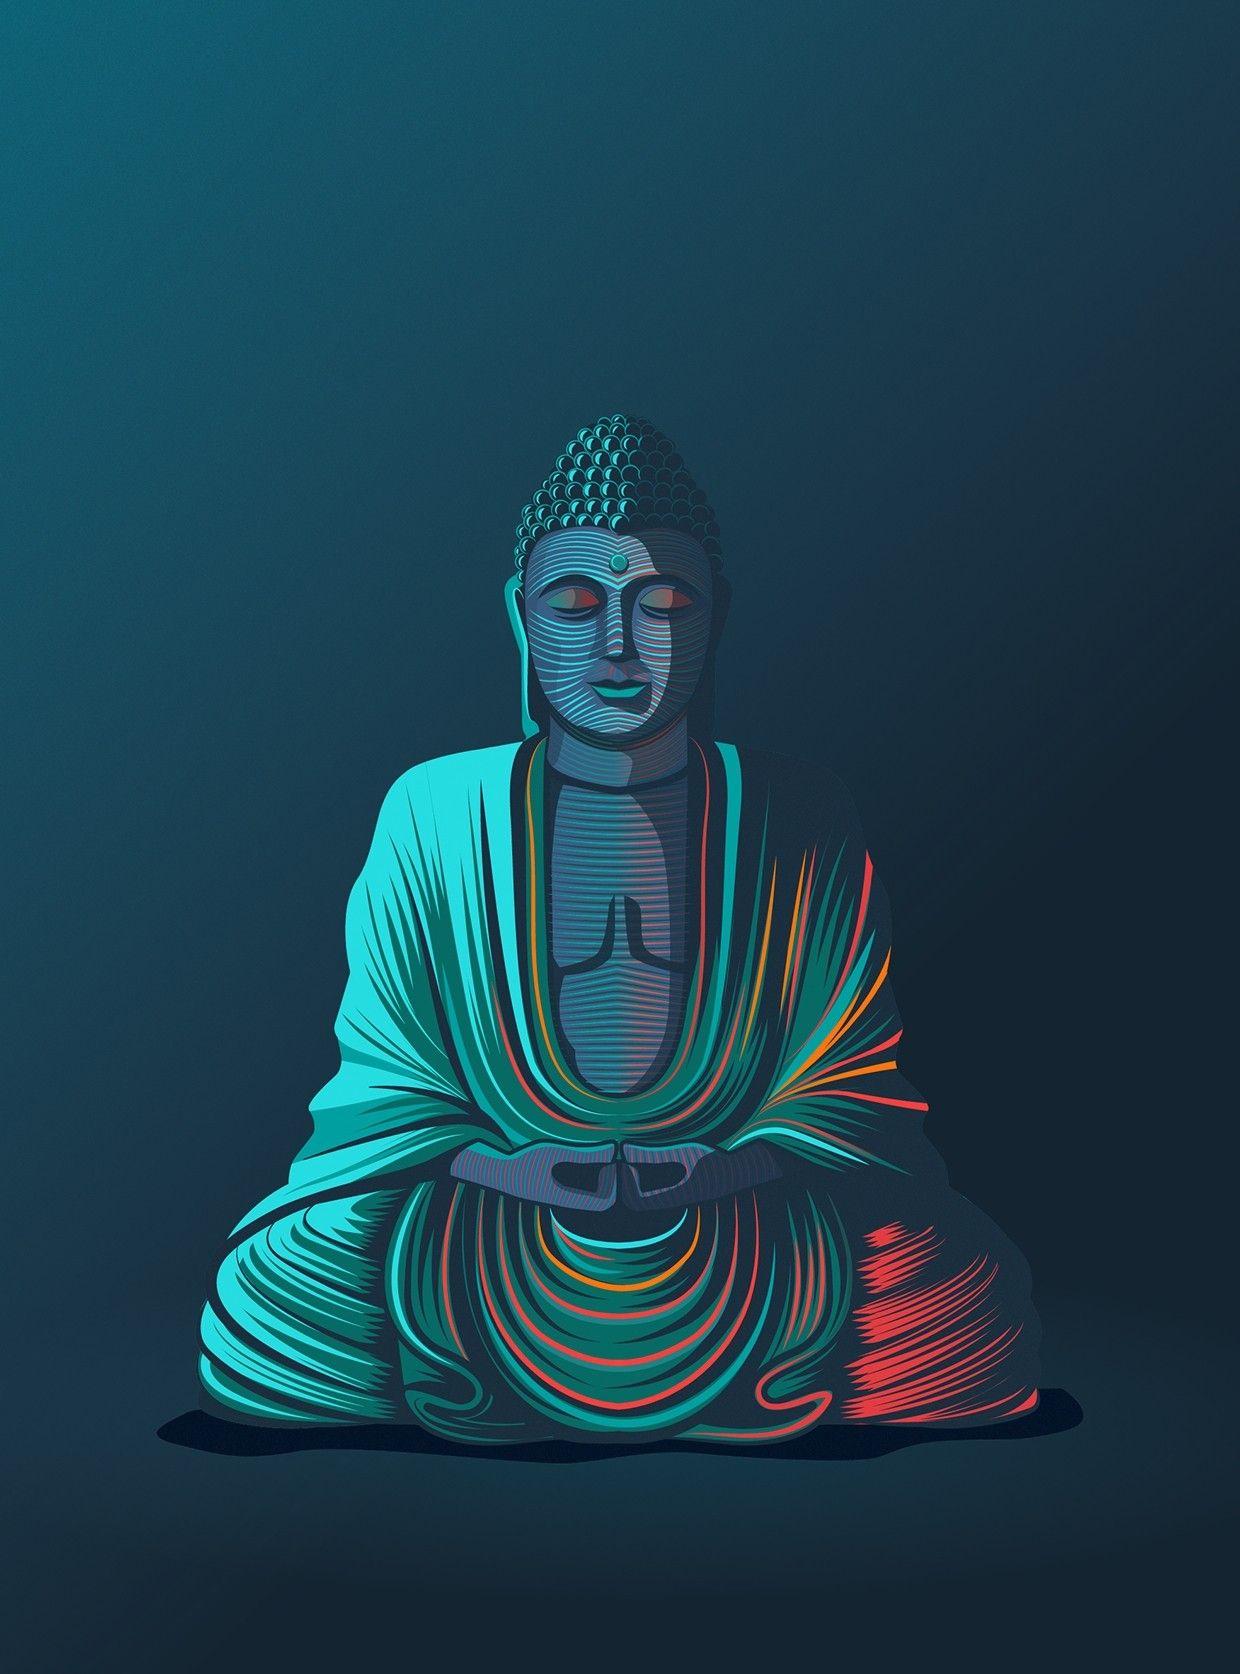 Pin By Mariola Nizialek On Buddha Zitate Bilder Buddha Art